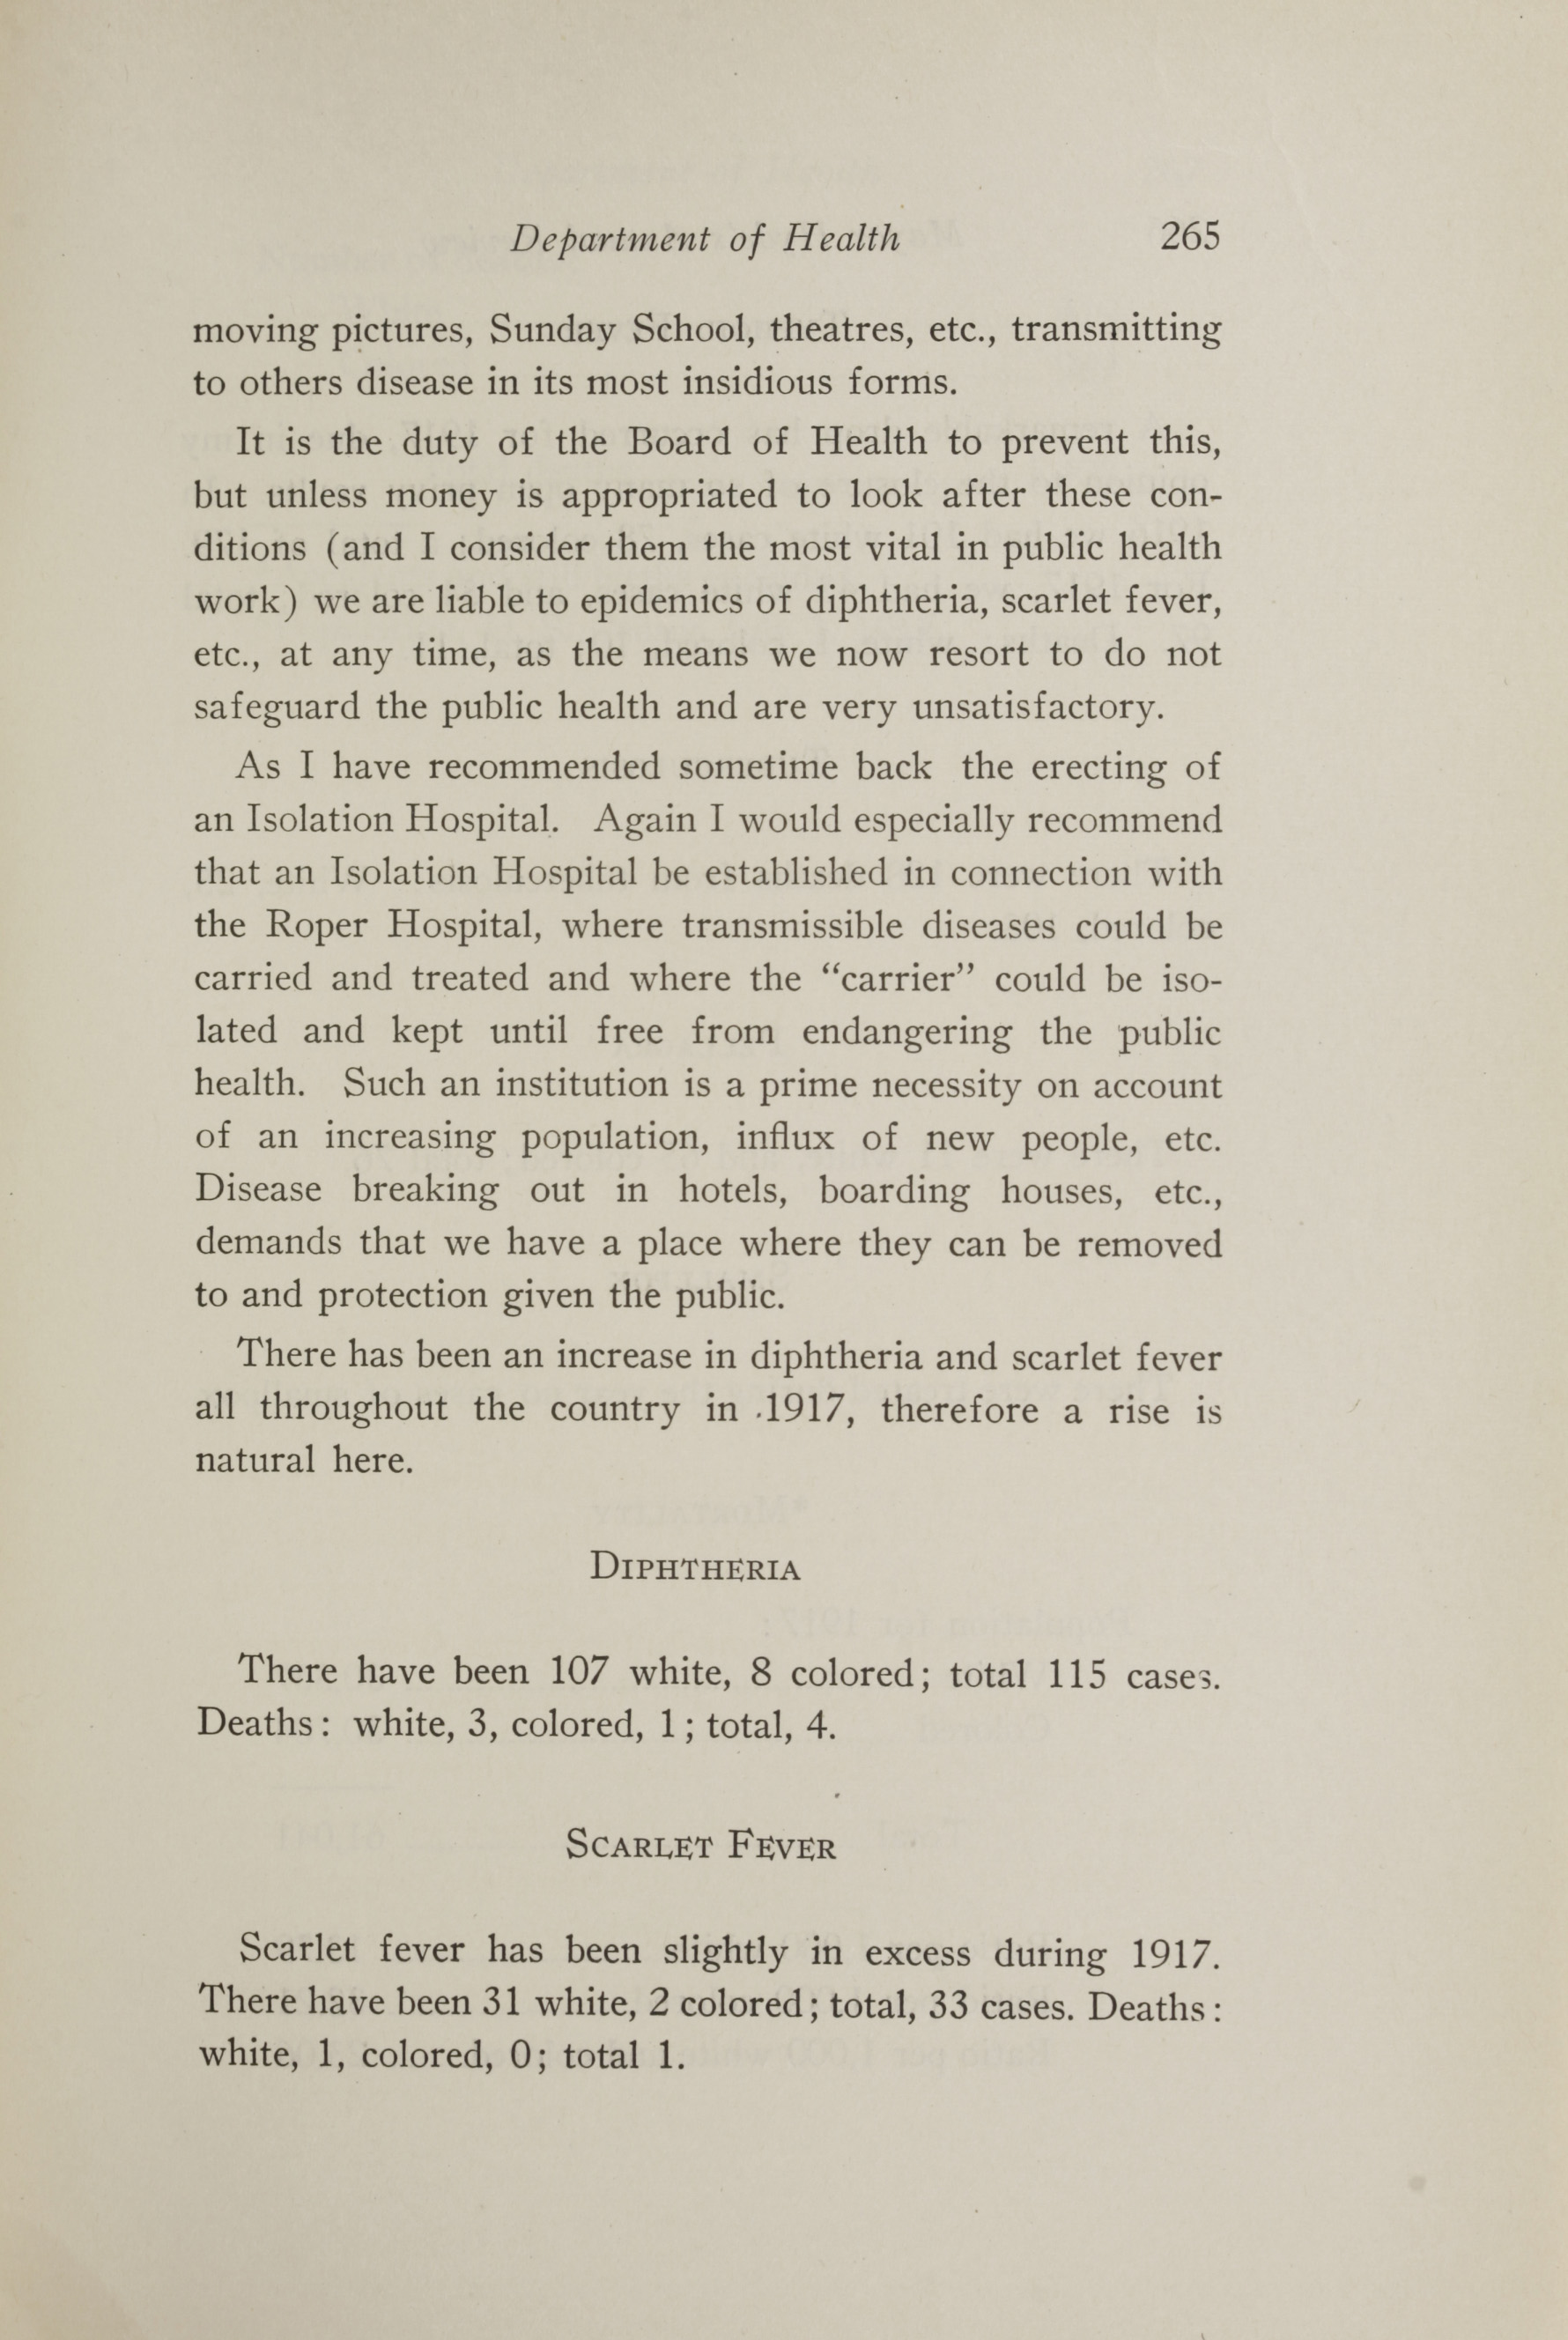 Charleston Yearbook, 1917, page 265